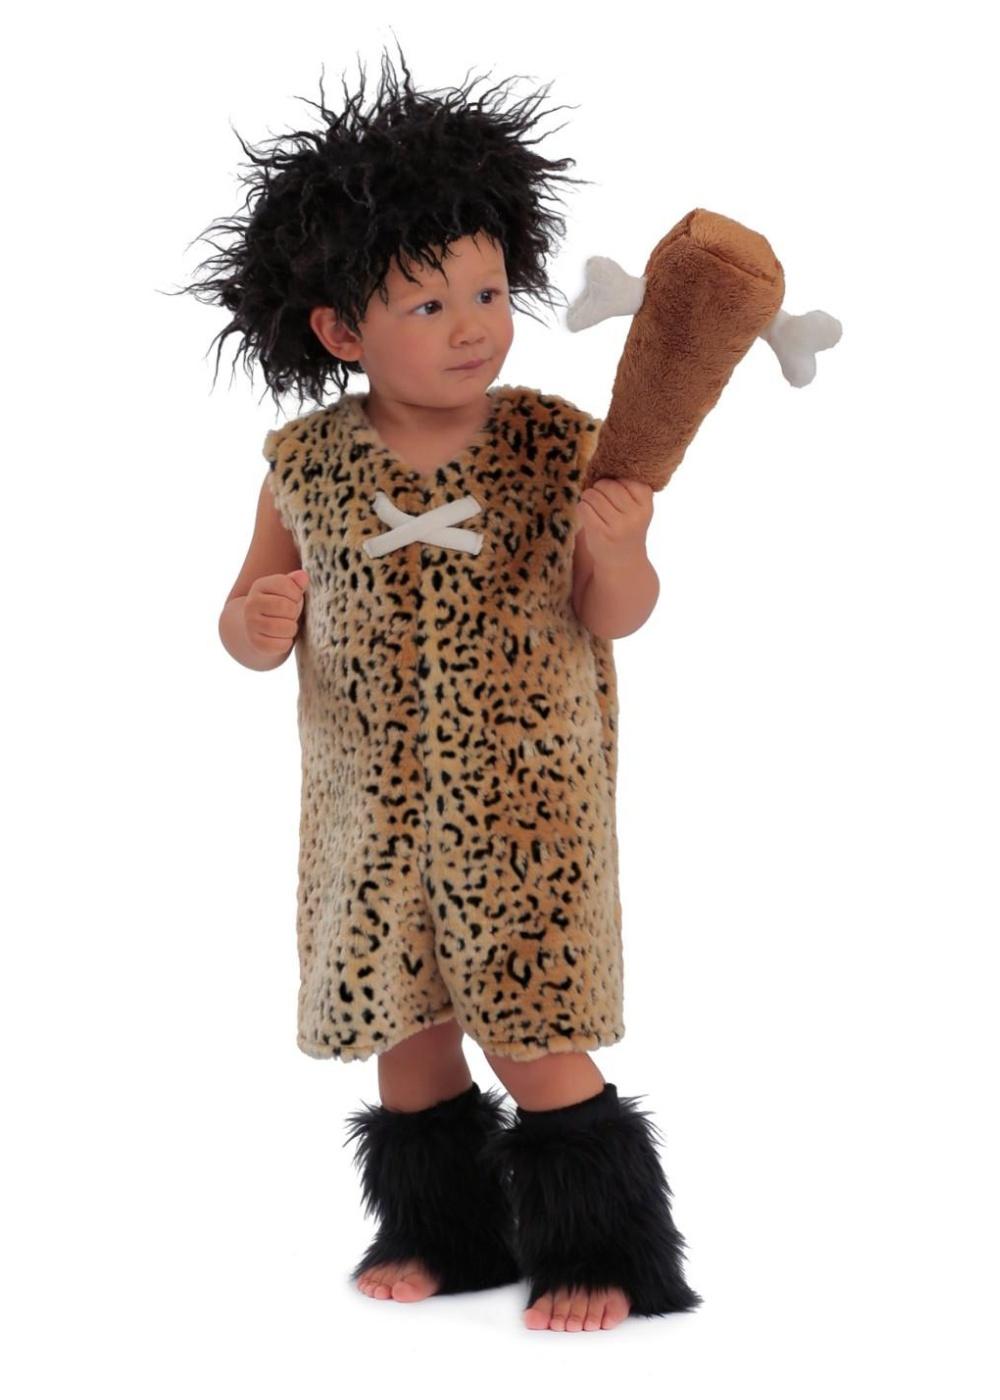 Caveman Costume Accessories : Caveman boy costume historical costumes